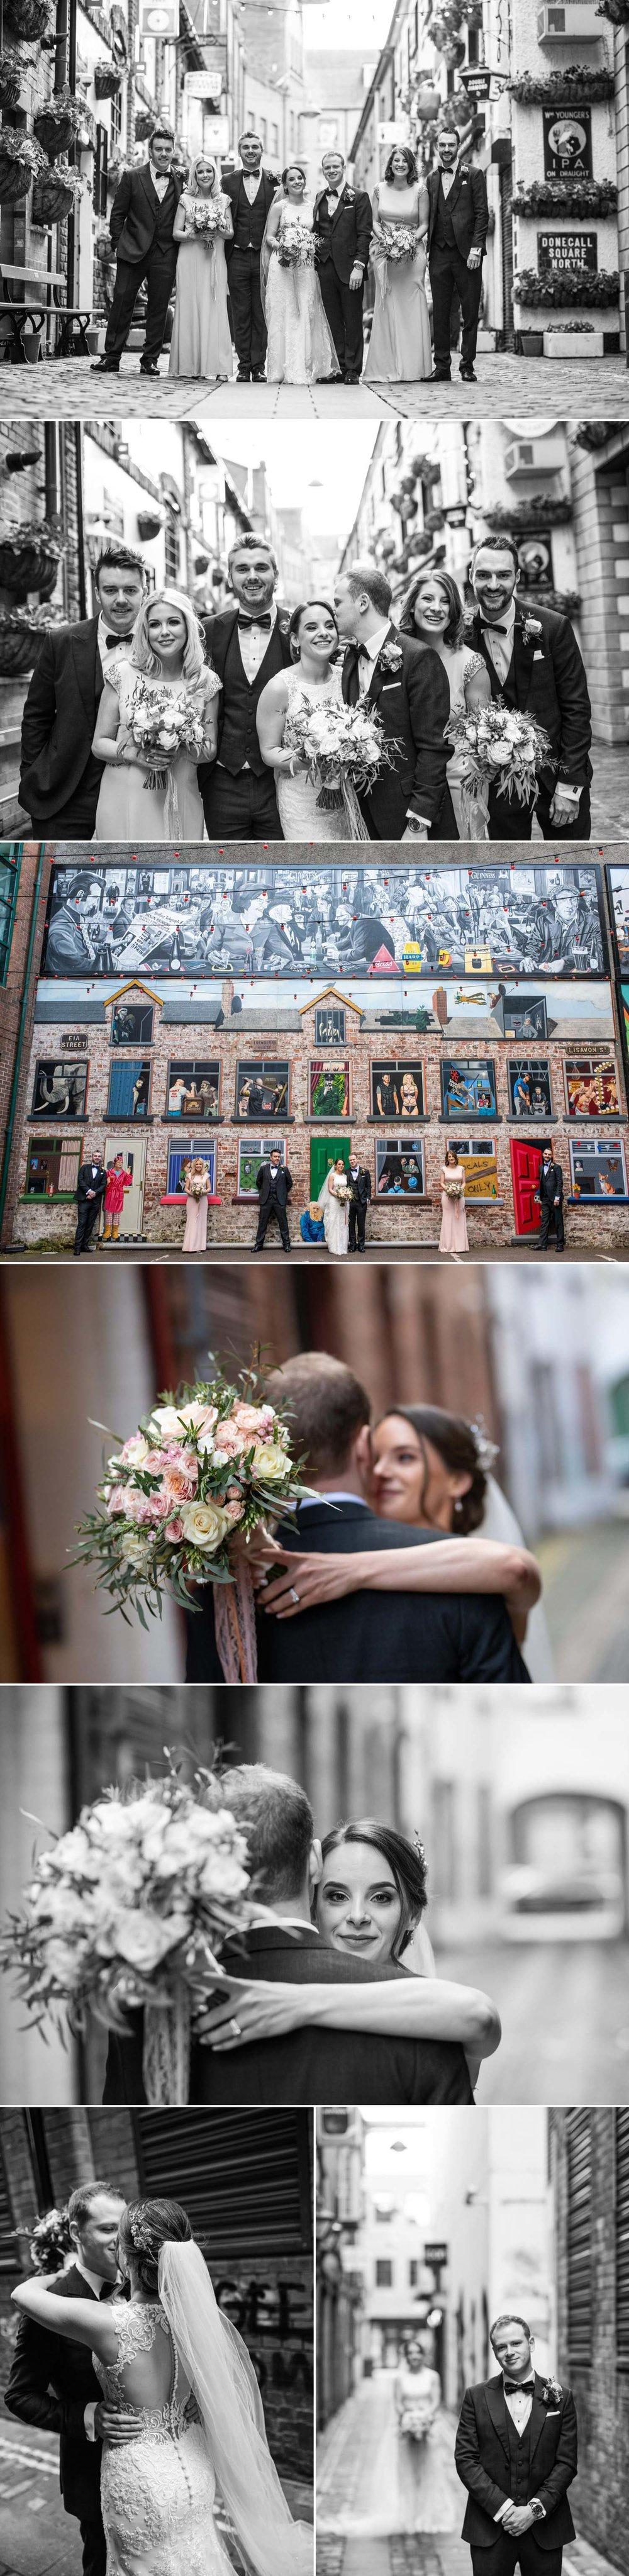 Merchant Hotel Belfast Wedding Photography James McGrillis 15.jpg